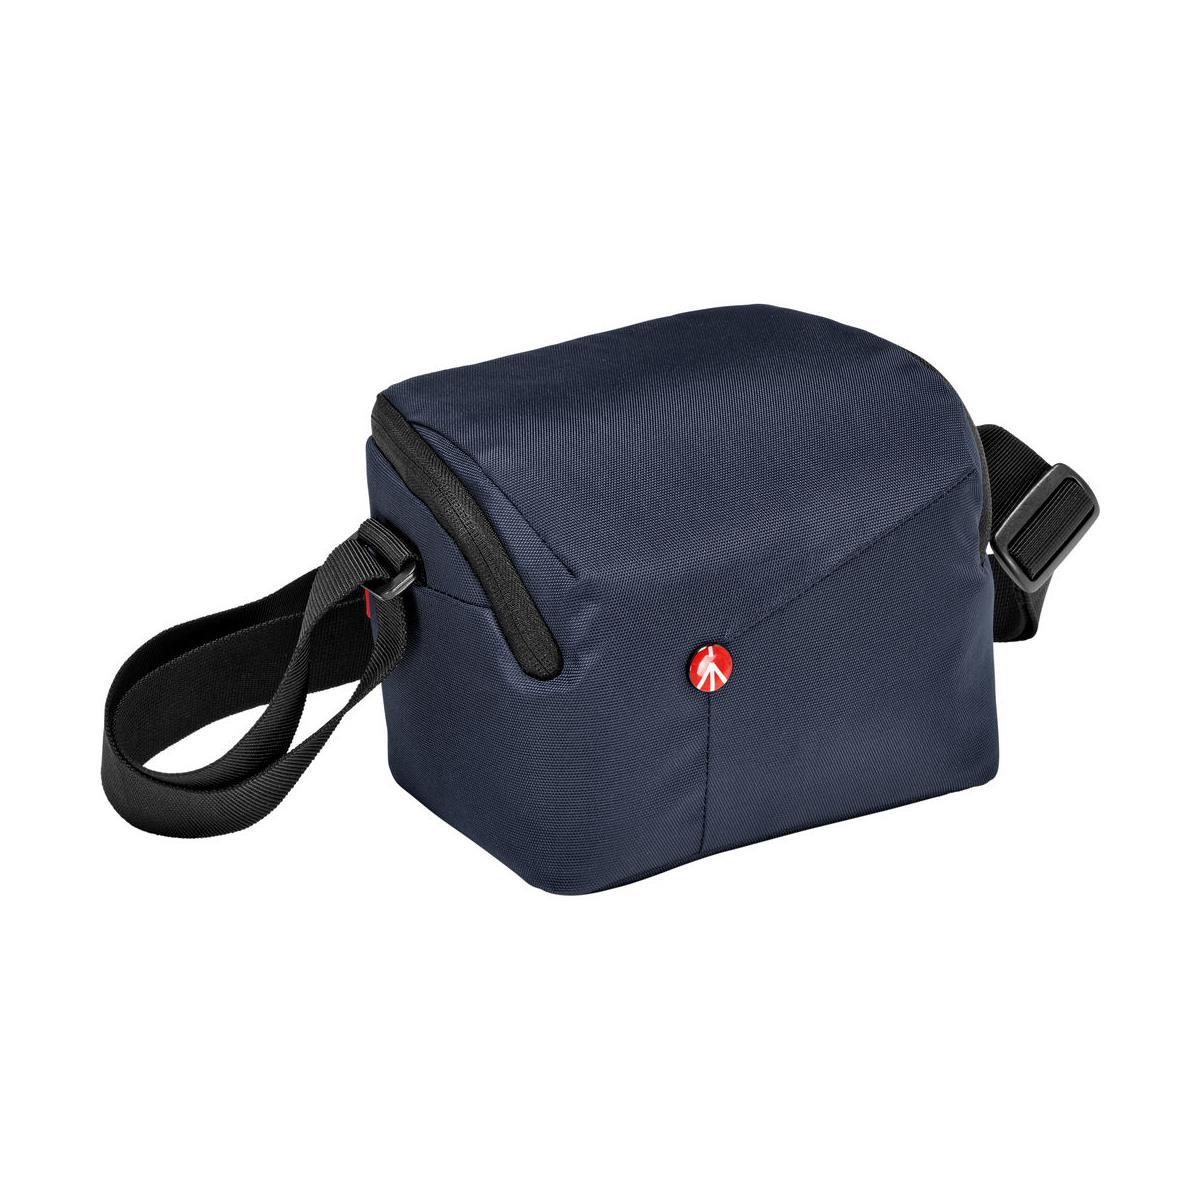 Manfrotto NX Shoulder Bag + Mini Tripod $20 + free s/h